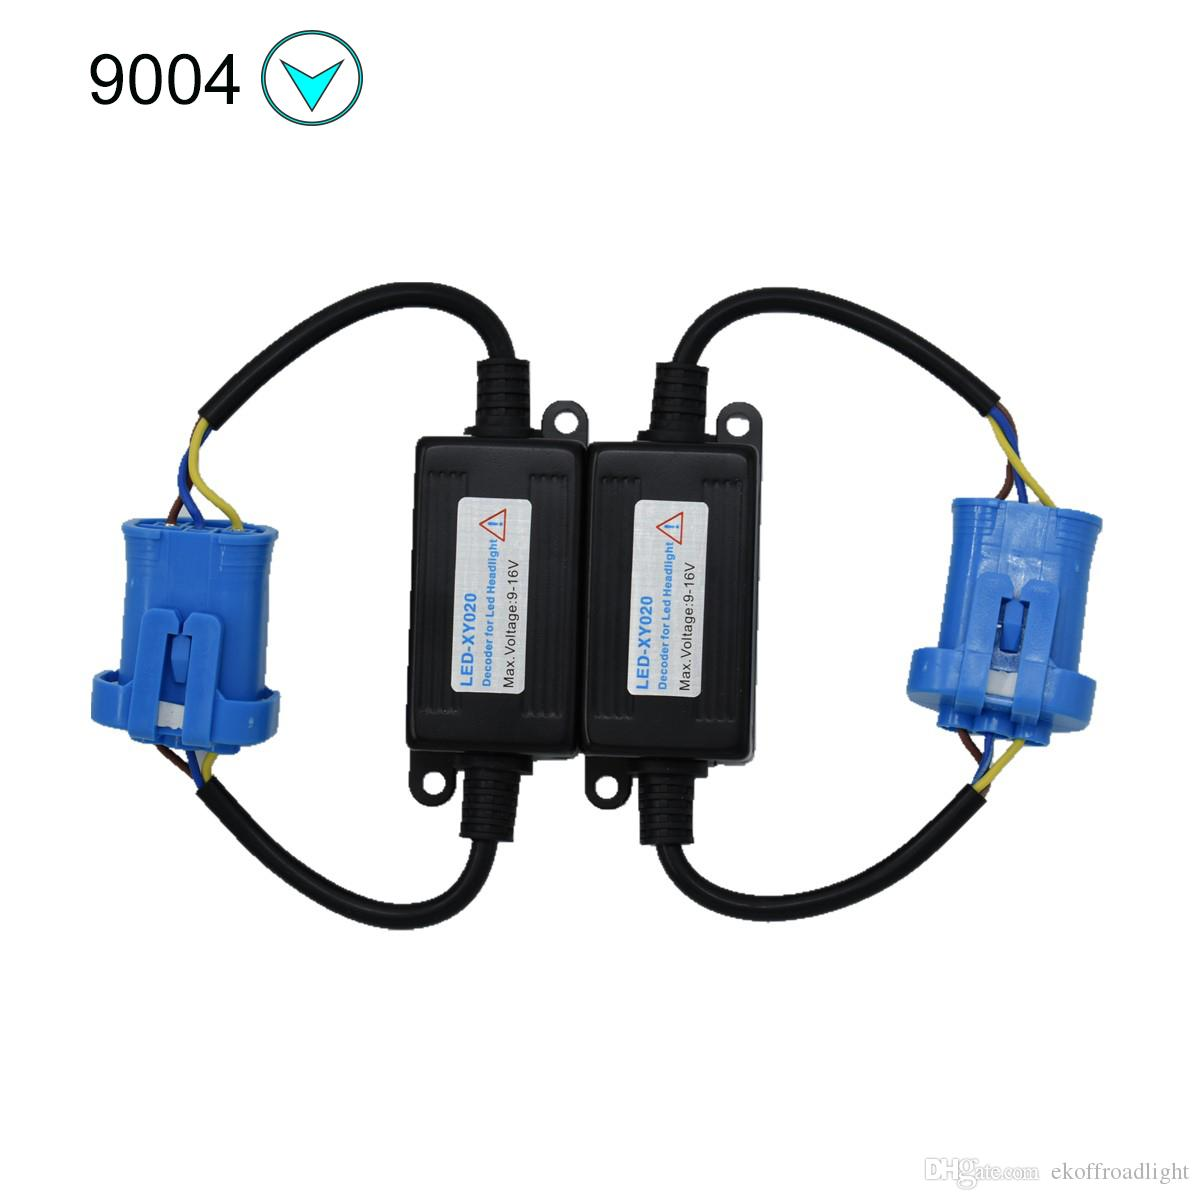 hight resolution of 2019 ecahayaku h3 9005 9006 h1 h11 h4 h7 led canbus car headlight decoder wiring adapter drl led lamp error canceler fog light canbus from ekoffroadlight